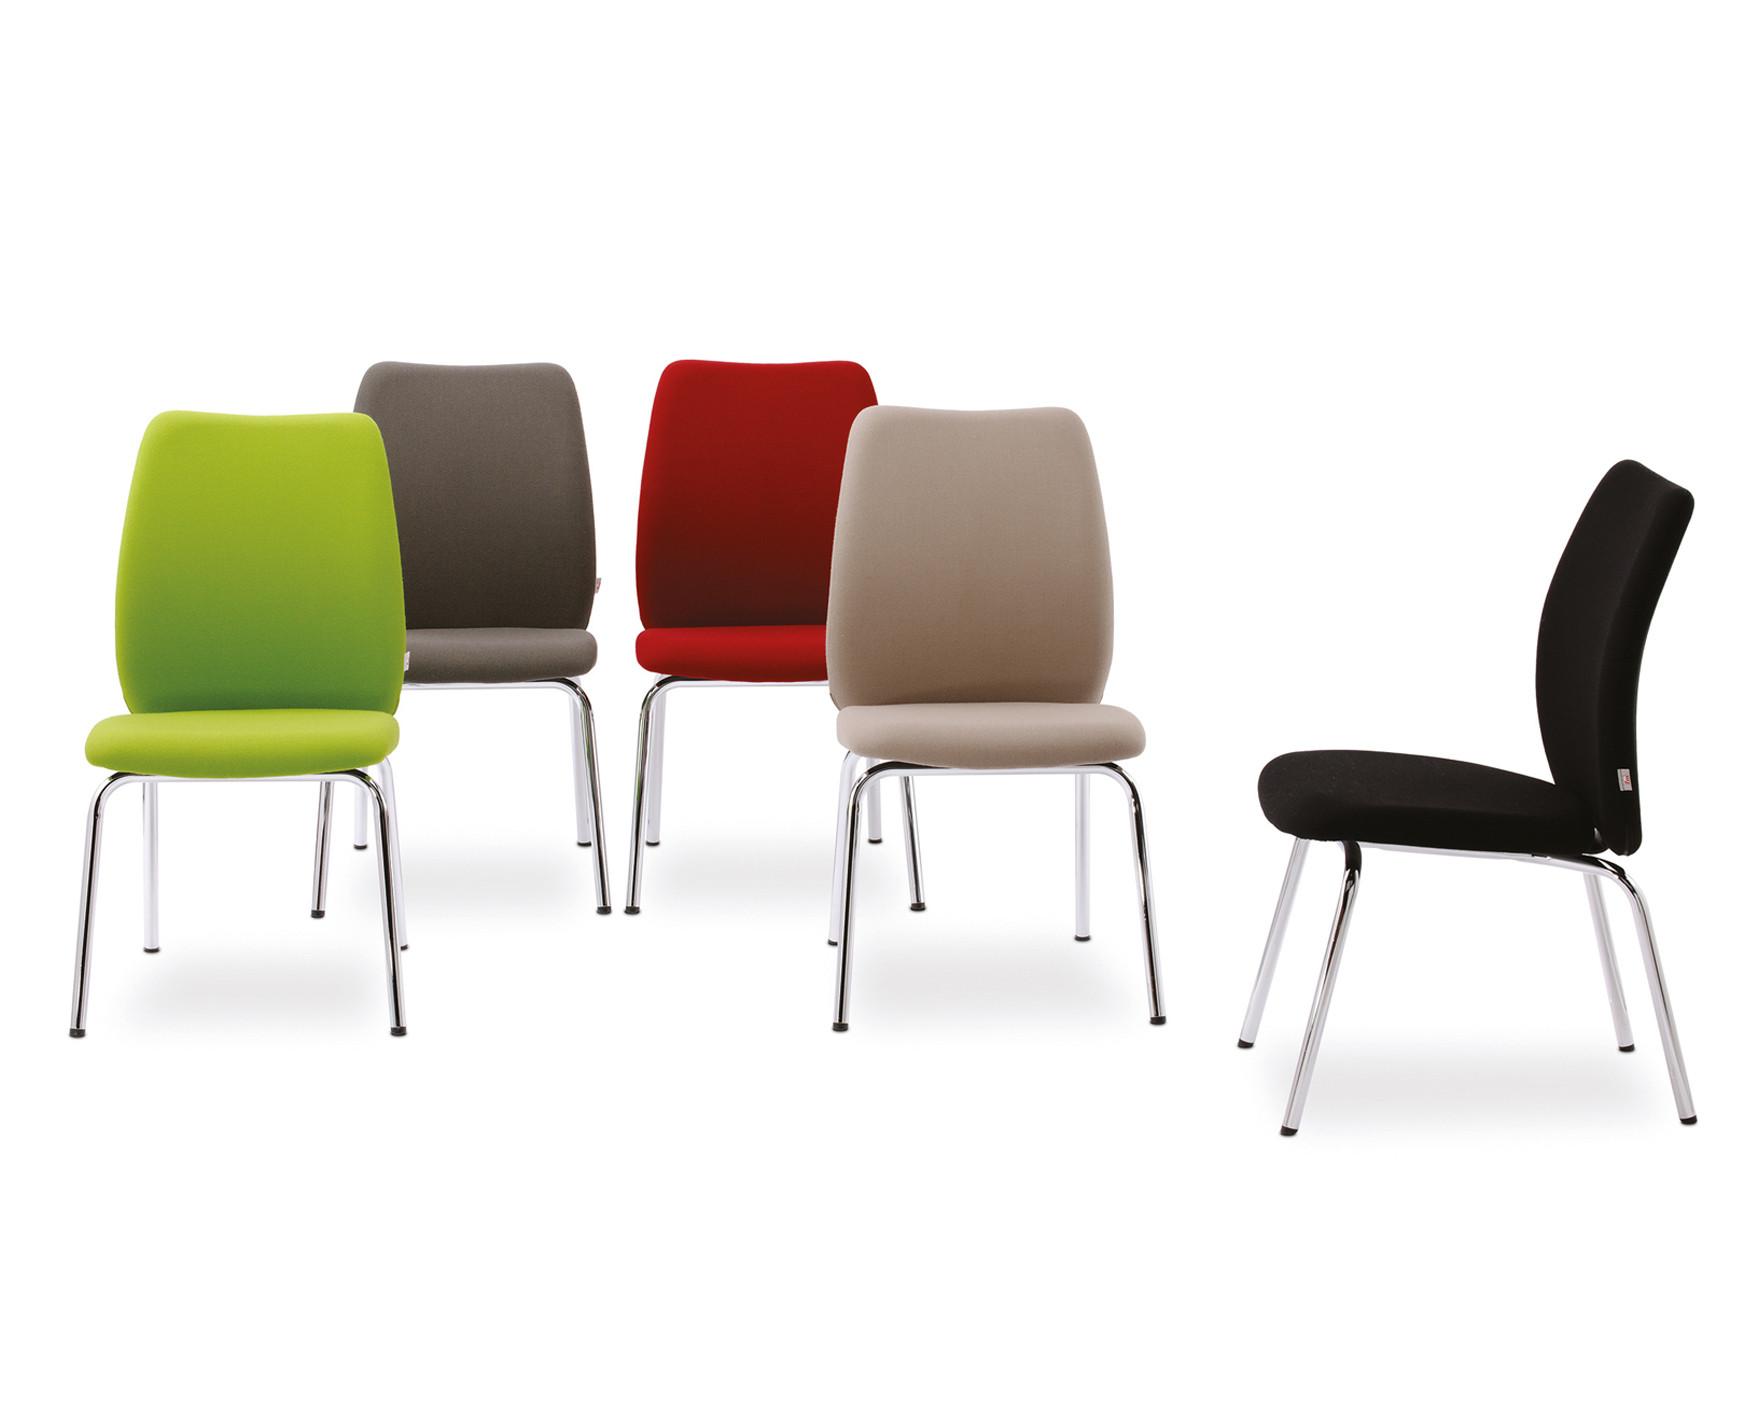 Besucherstuhl Konferenzstuhl Feeling Gruppe mehrere Farben